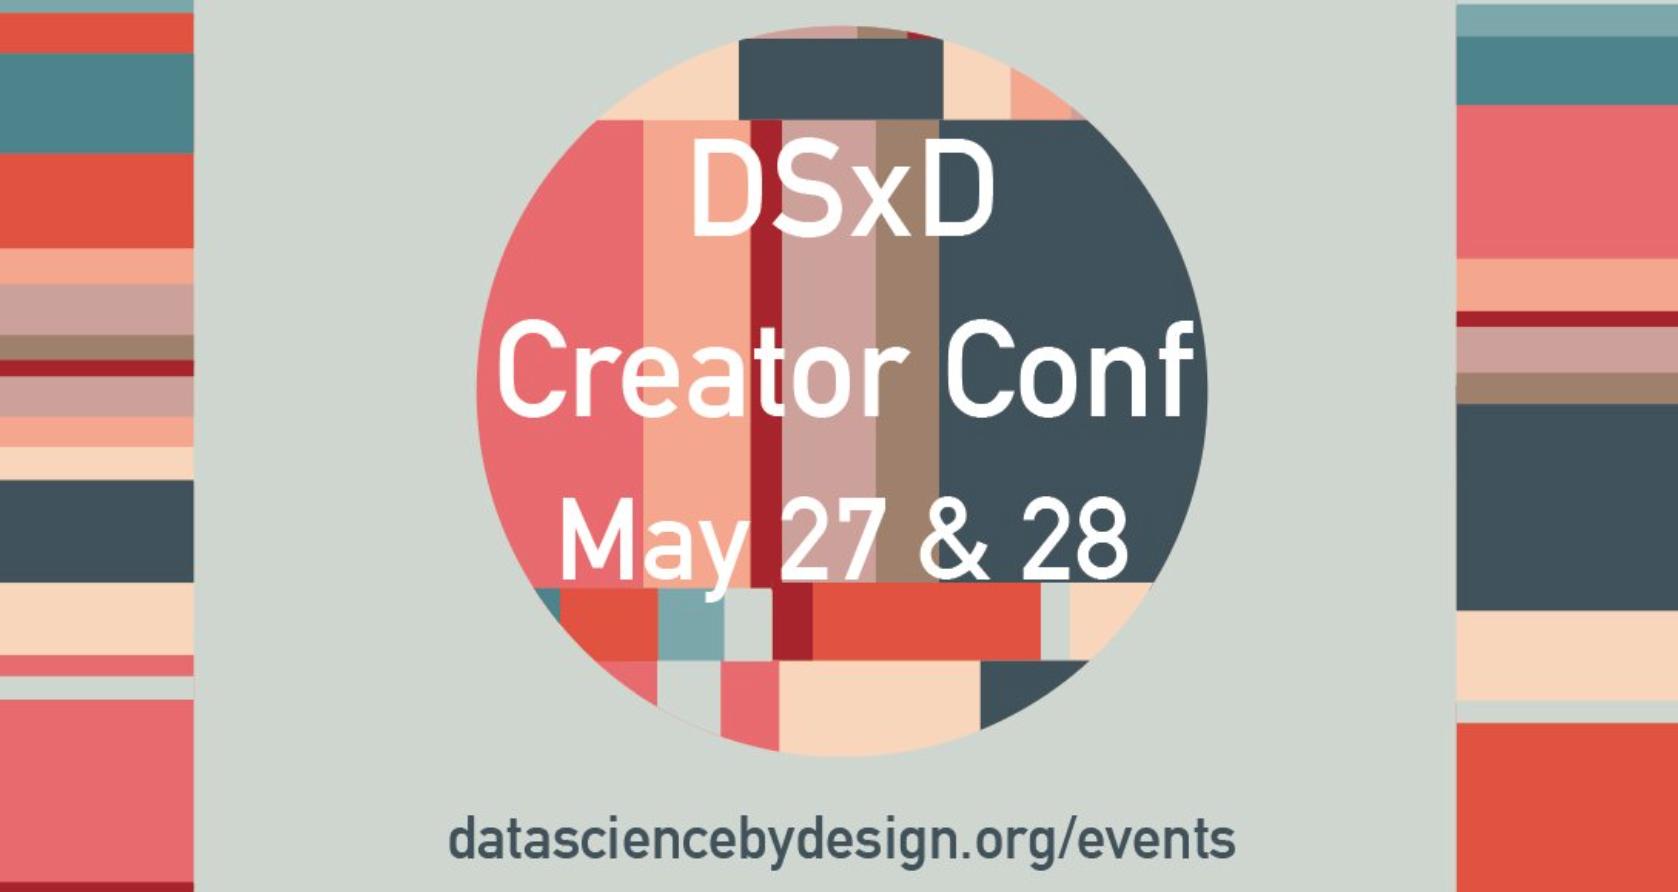 DSxD hi-res banner